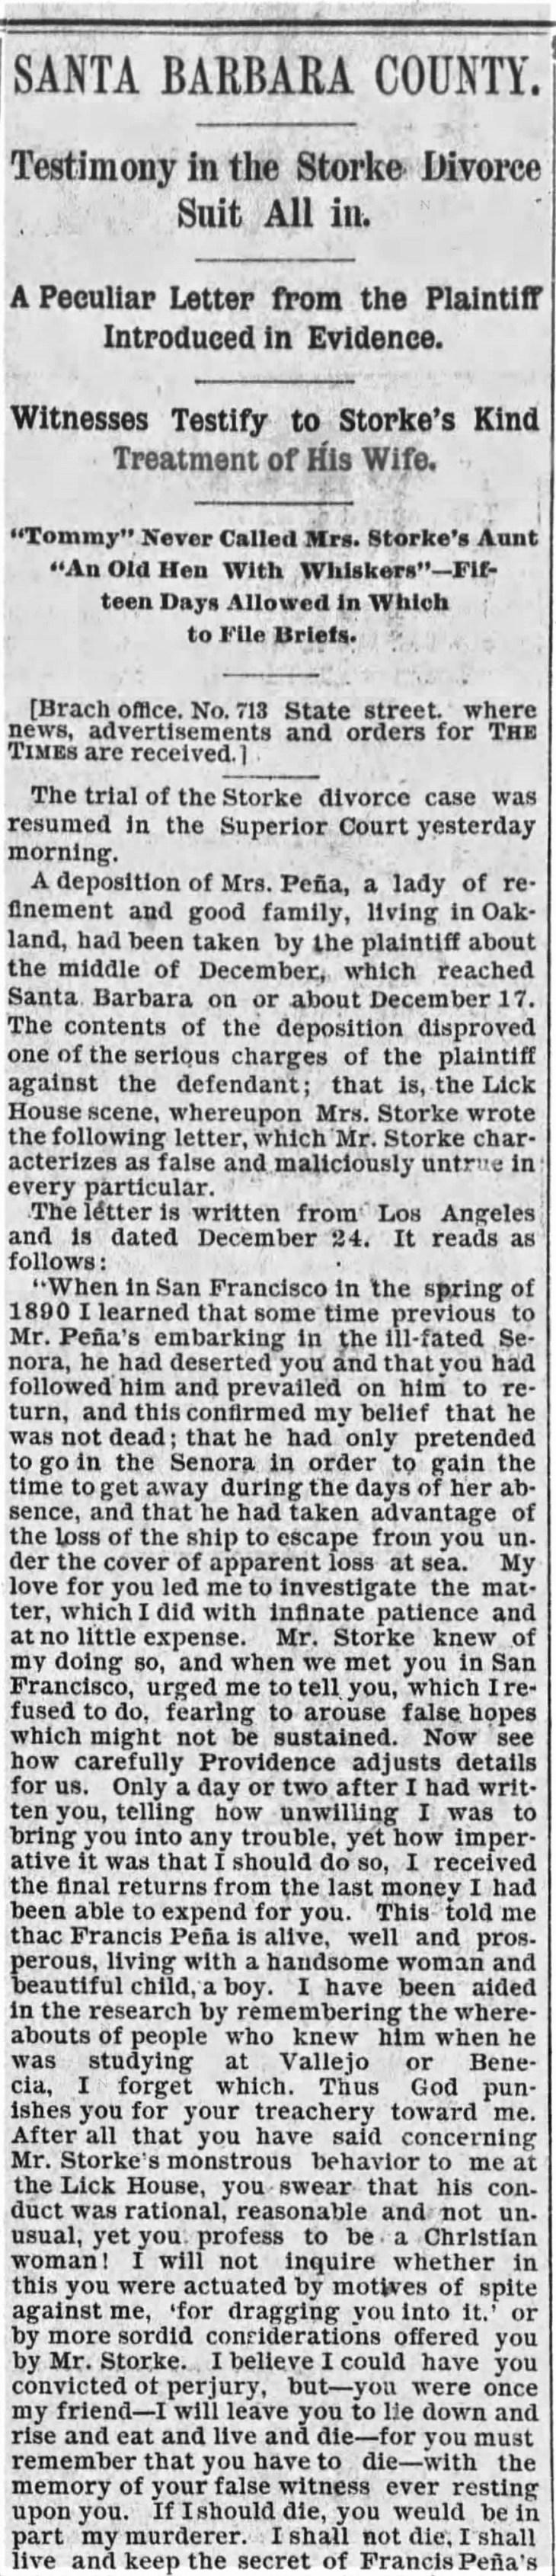 Yda insanity testimony detail The_Los_Angeles_Times_Sun__Jan_10__1892_